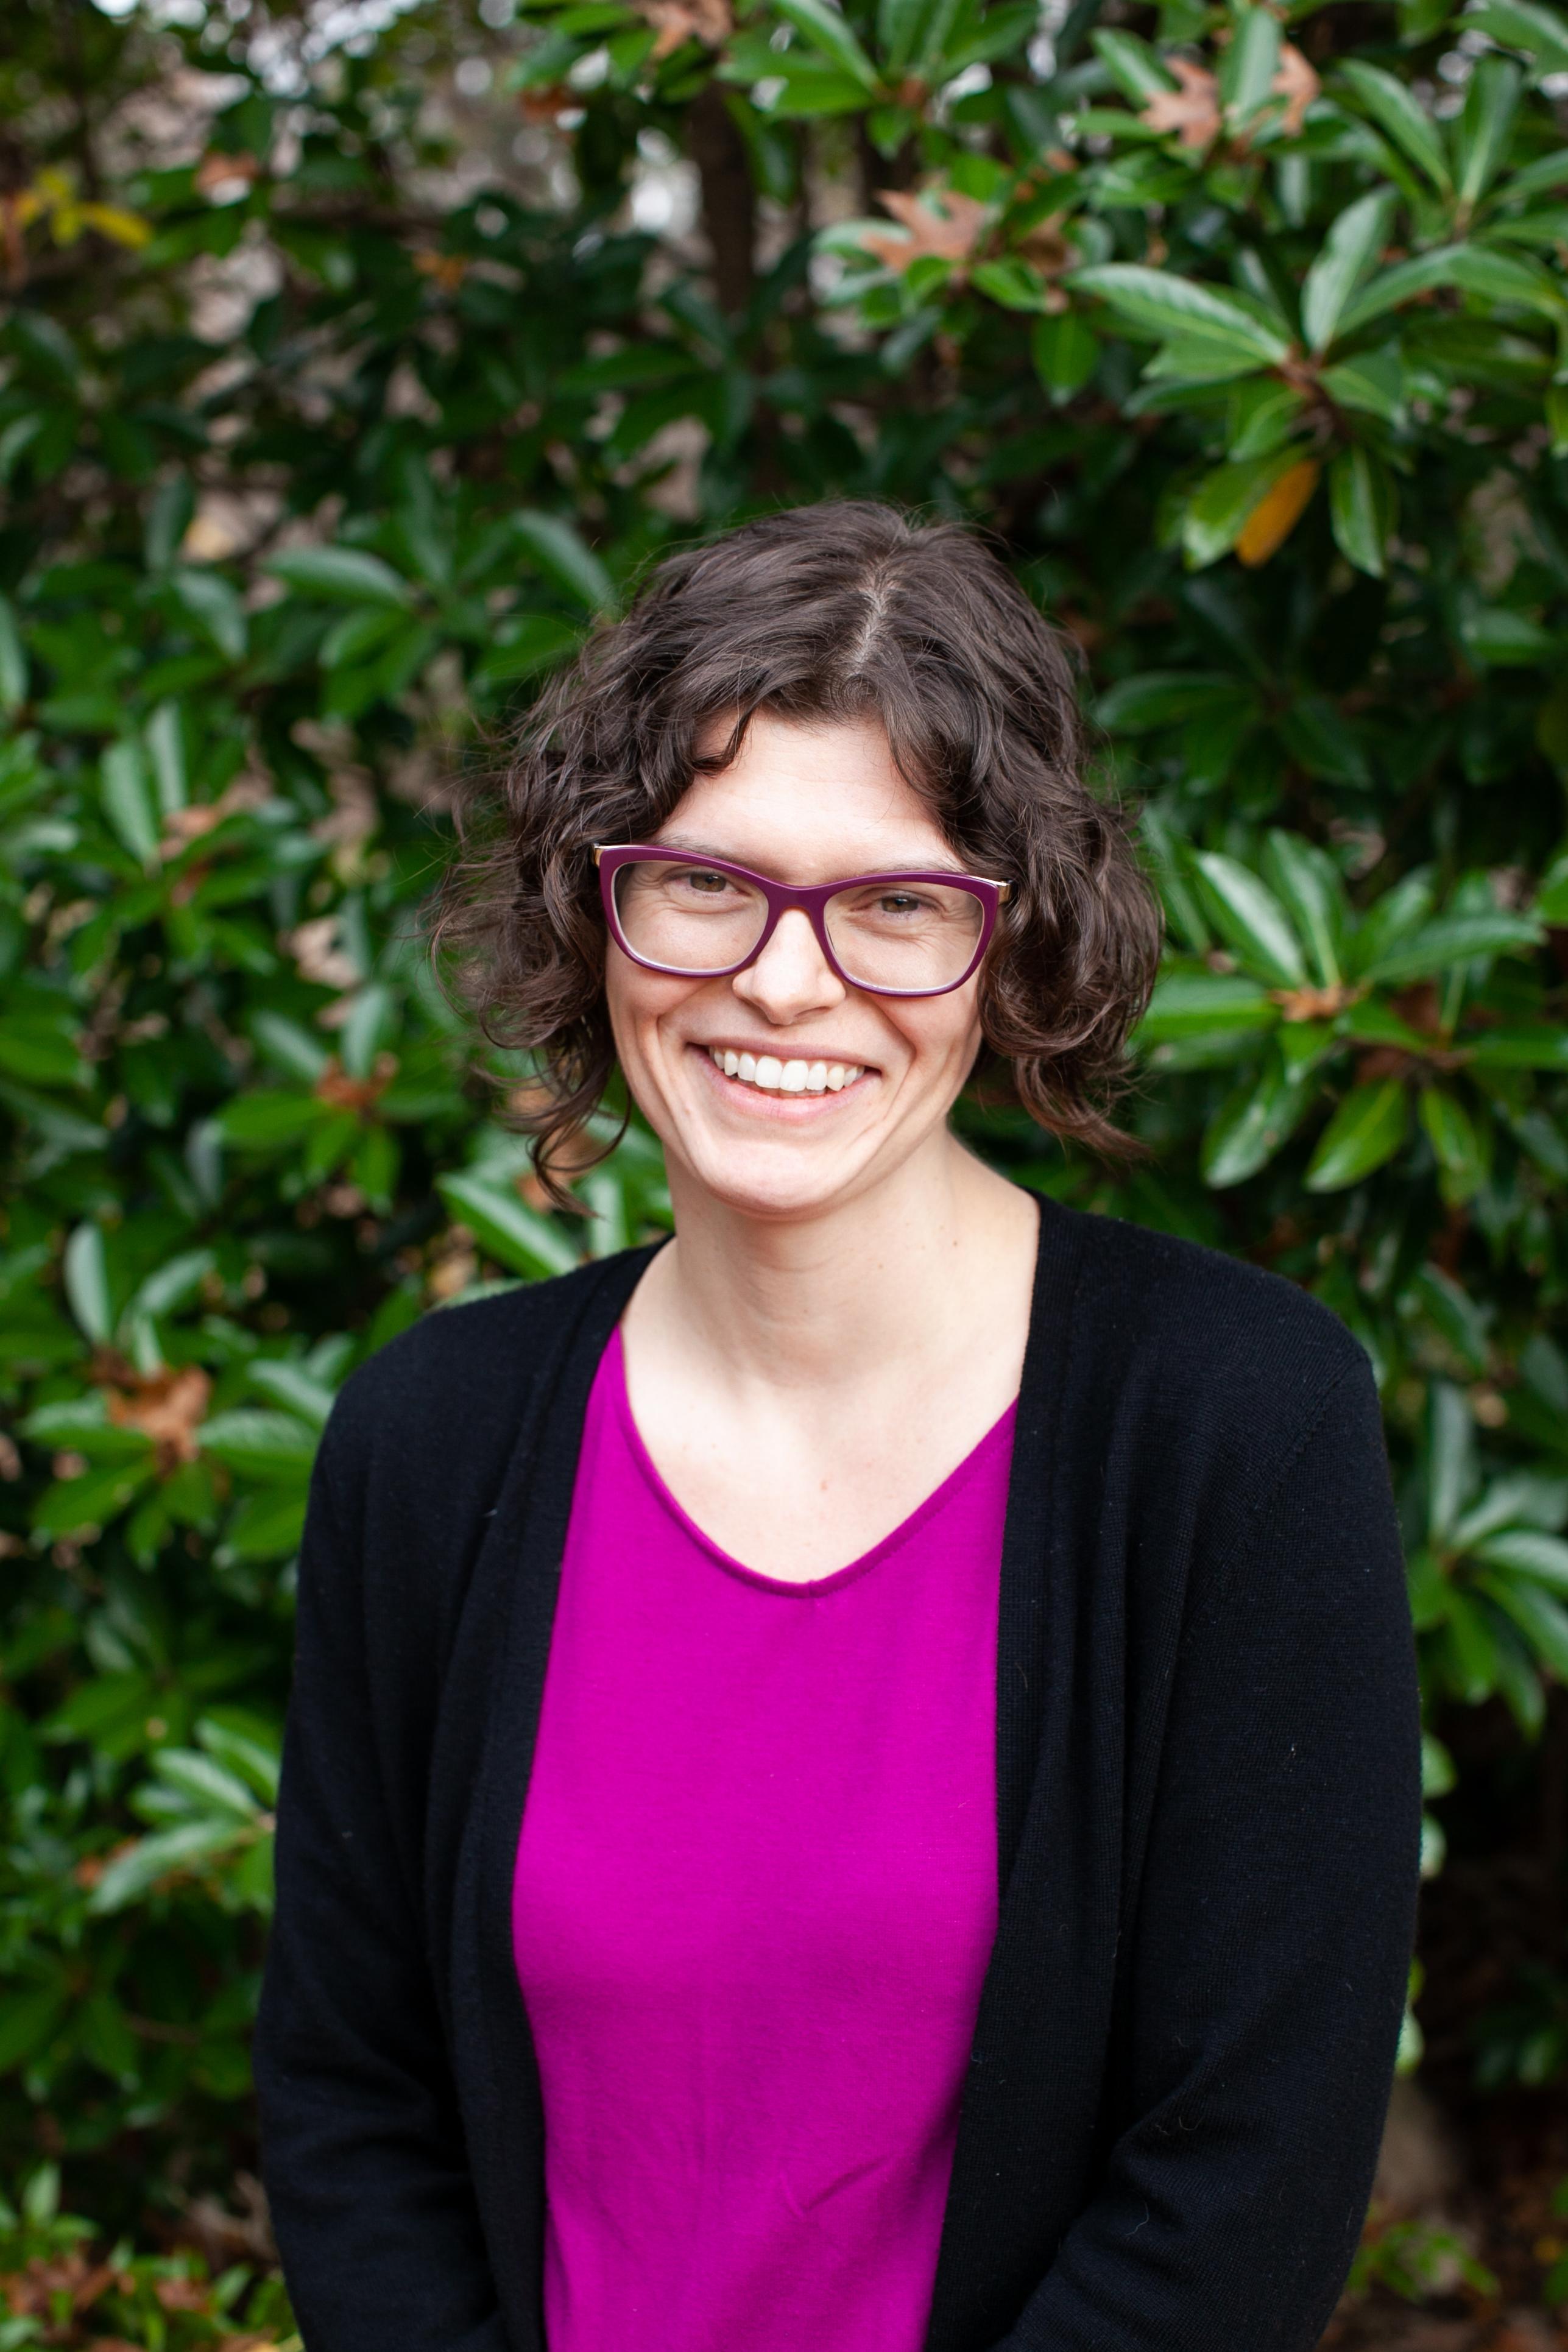 A headshot of Cheryl Thompson.